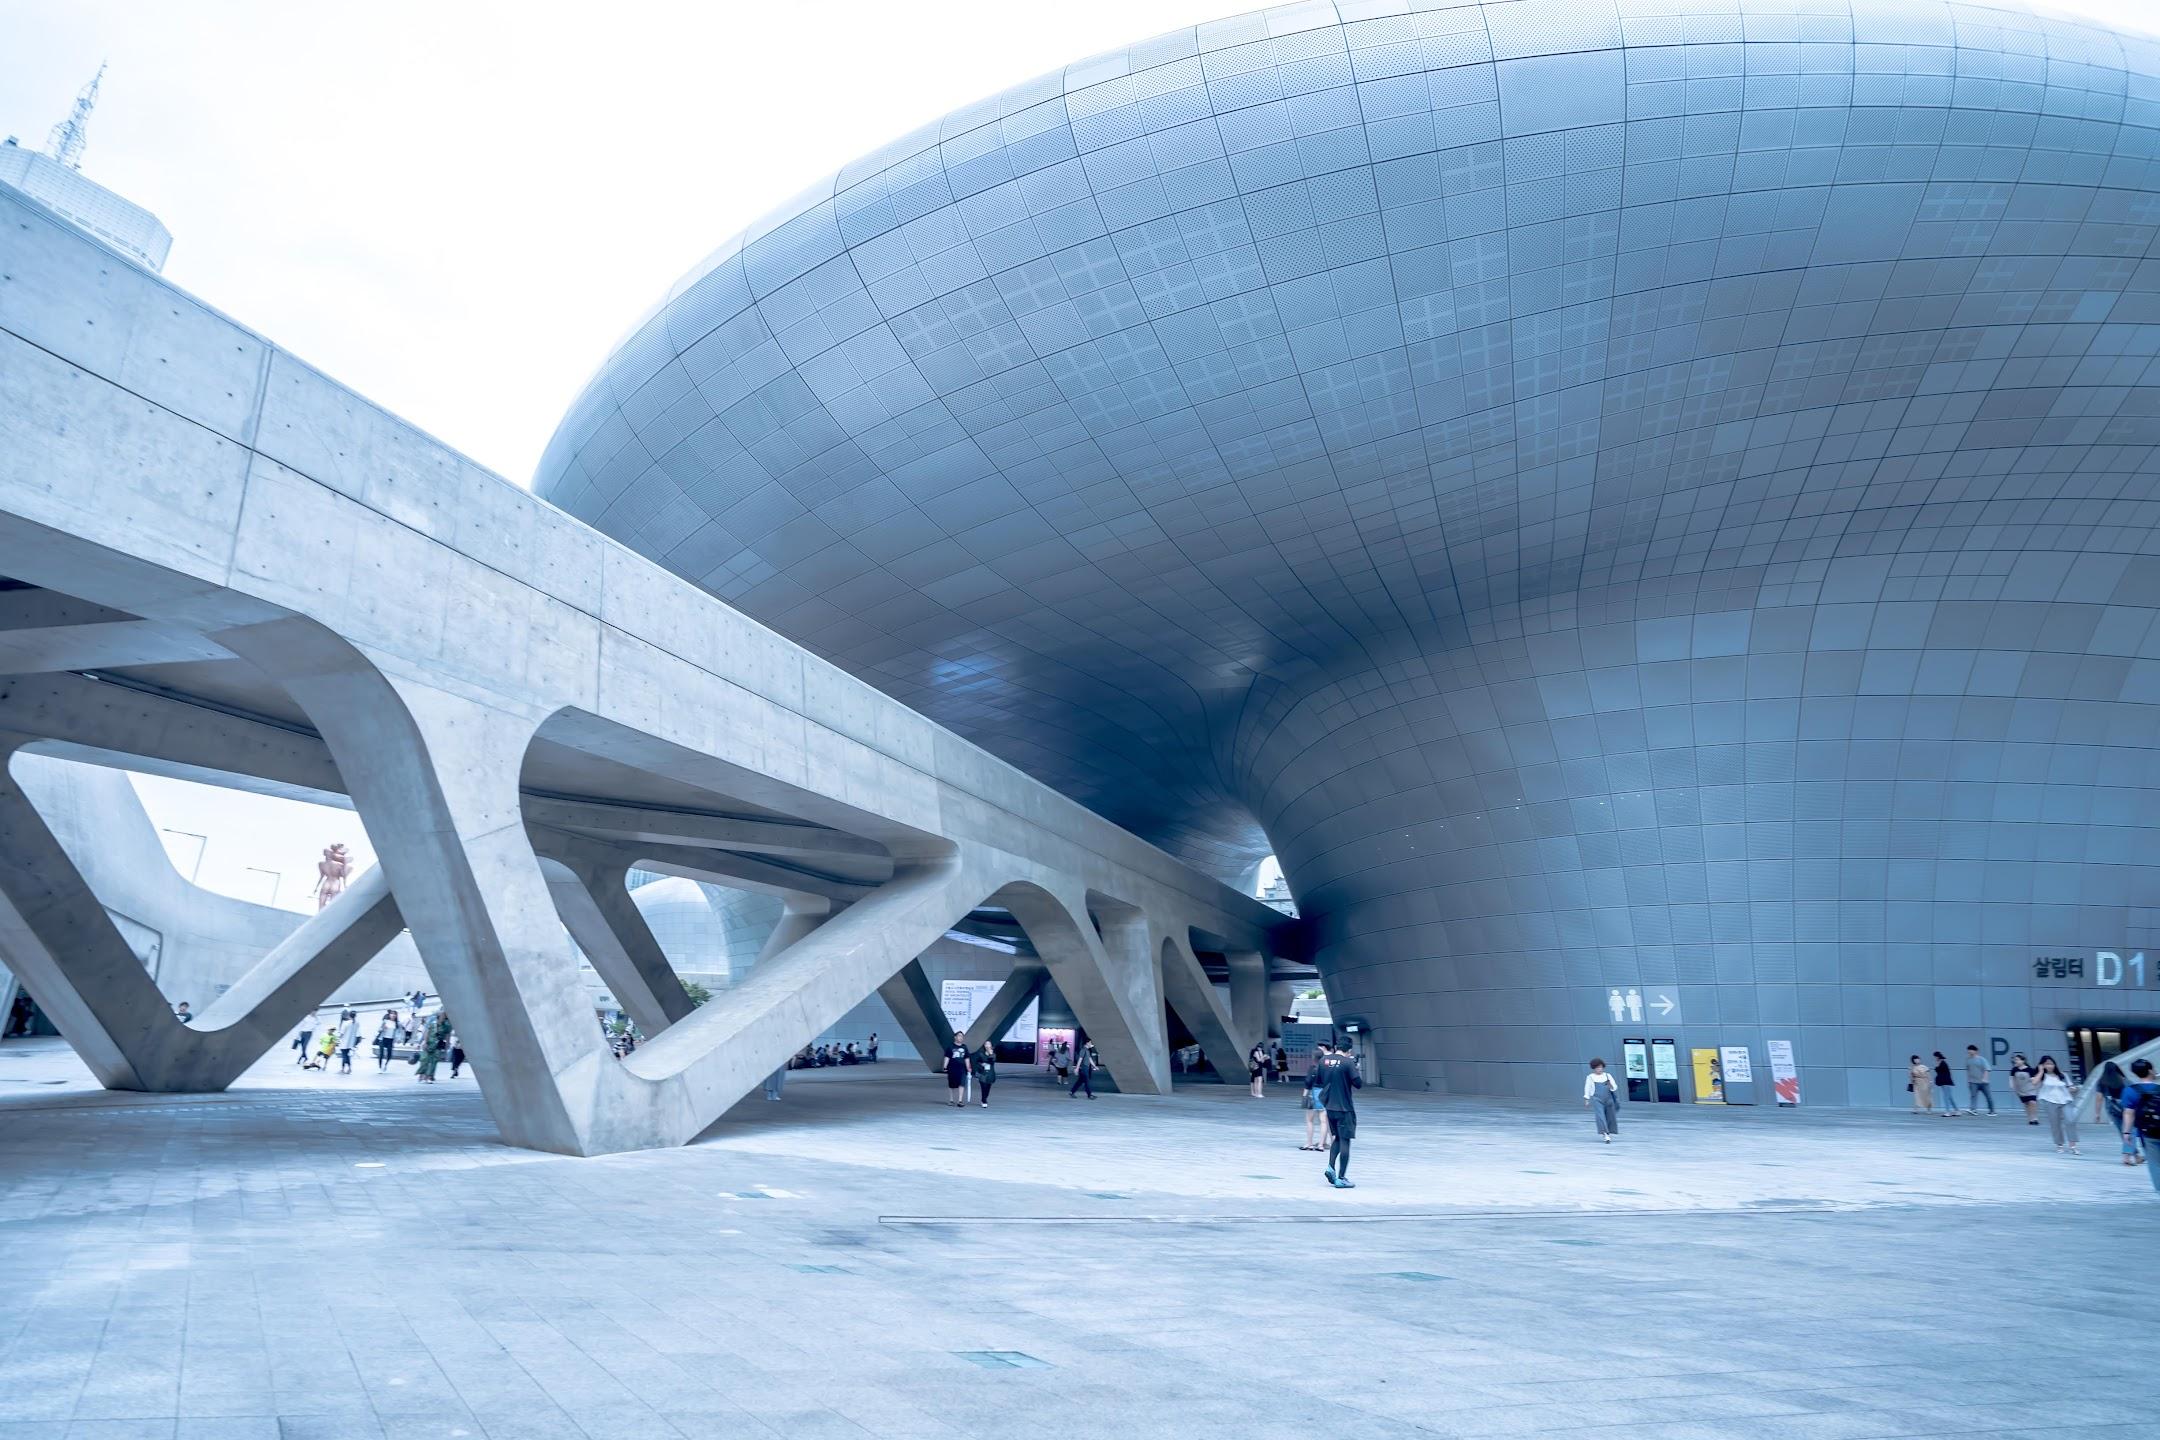 Seoul Dongdaemun Design Plaza (DDP)1